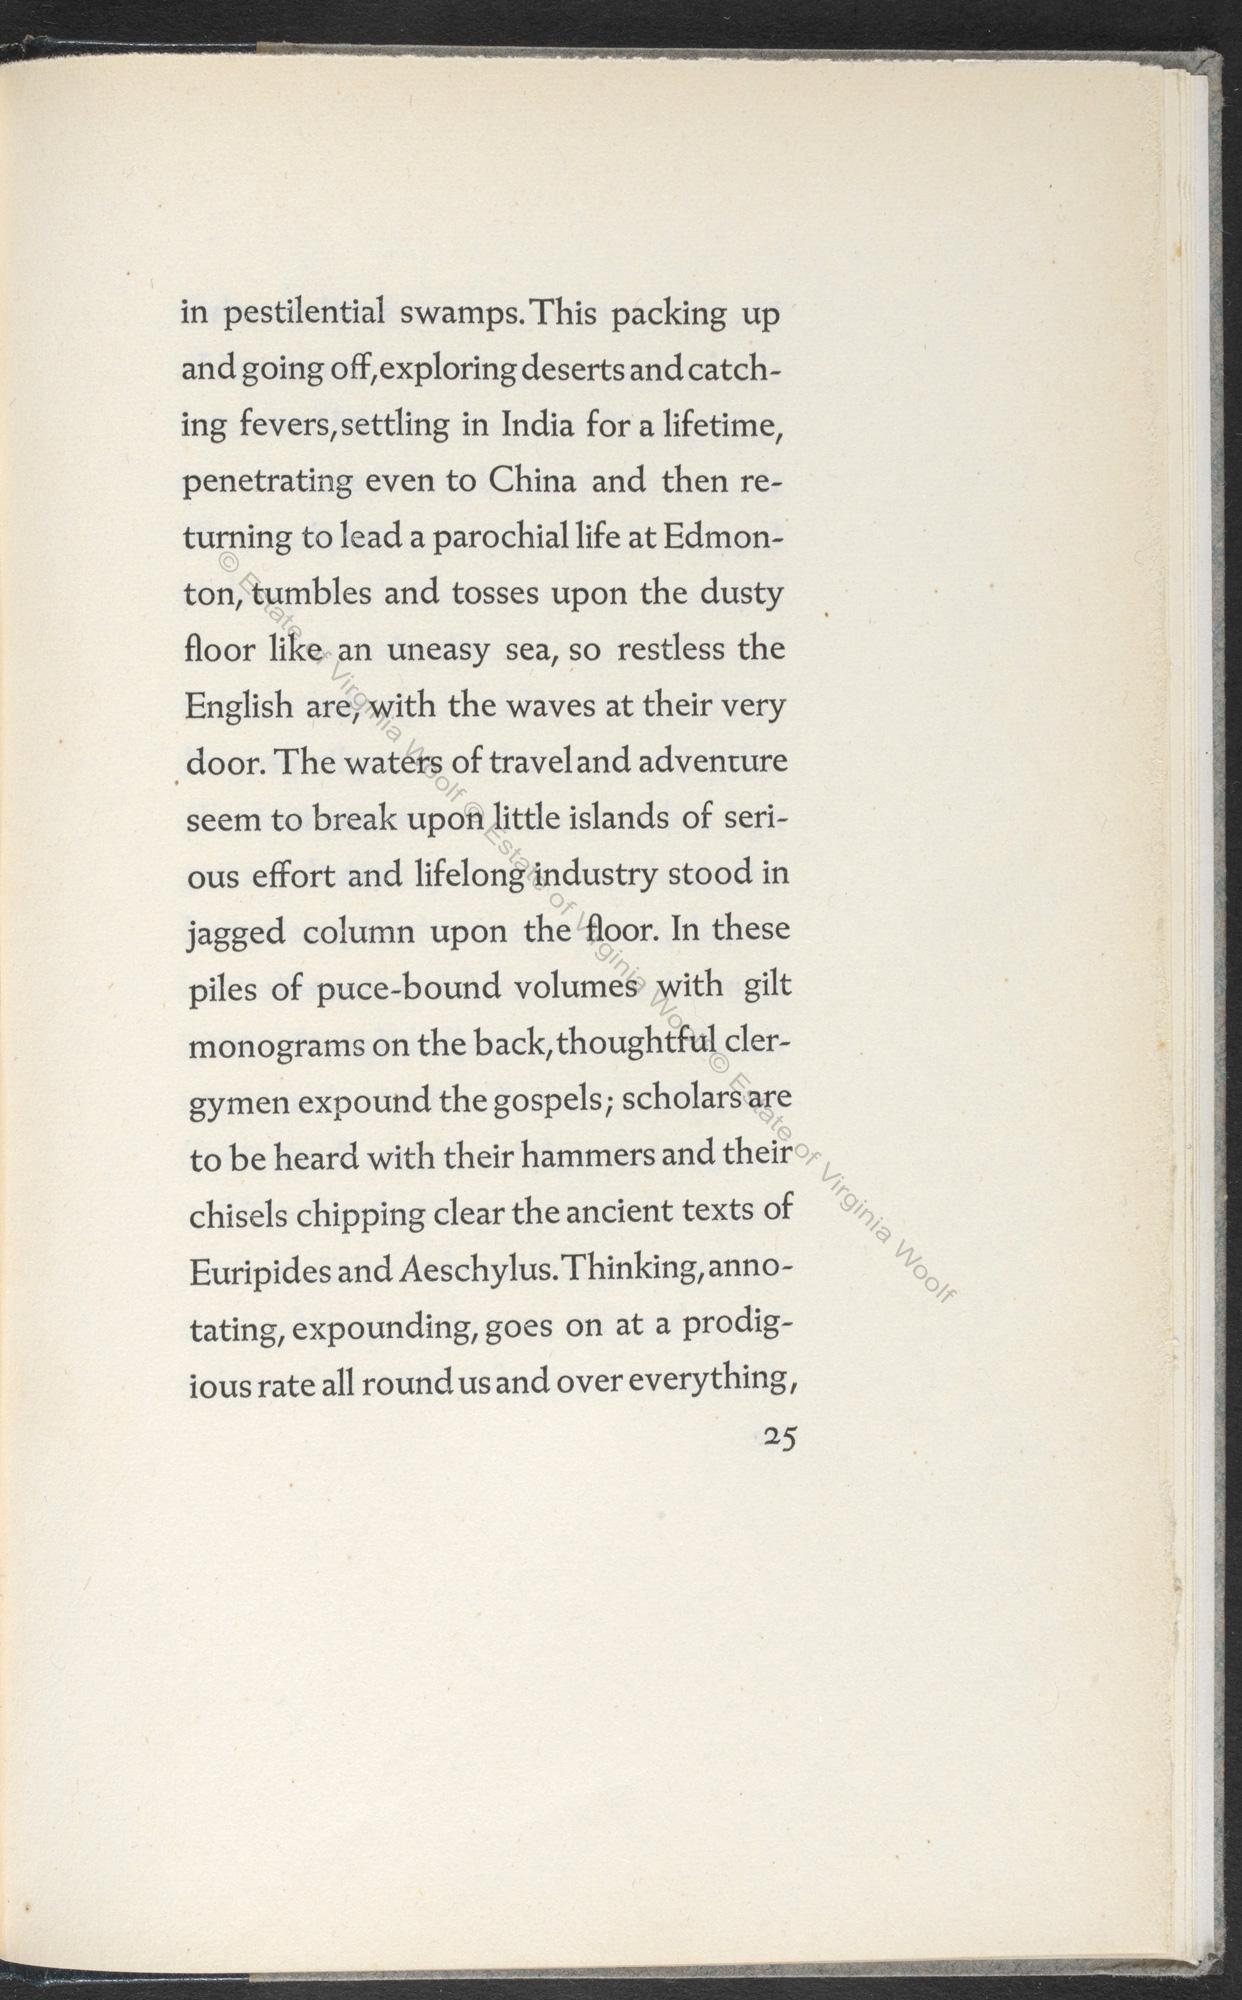 Street Haunting, an essay by Virginia Woolf